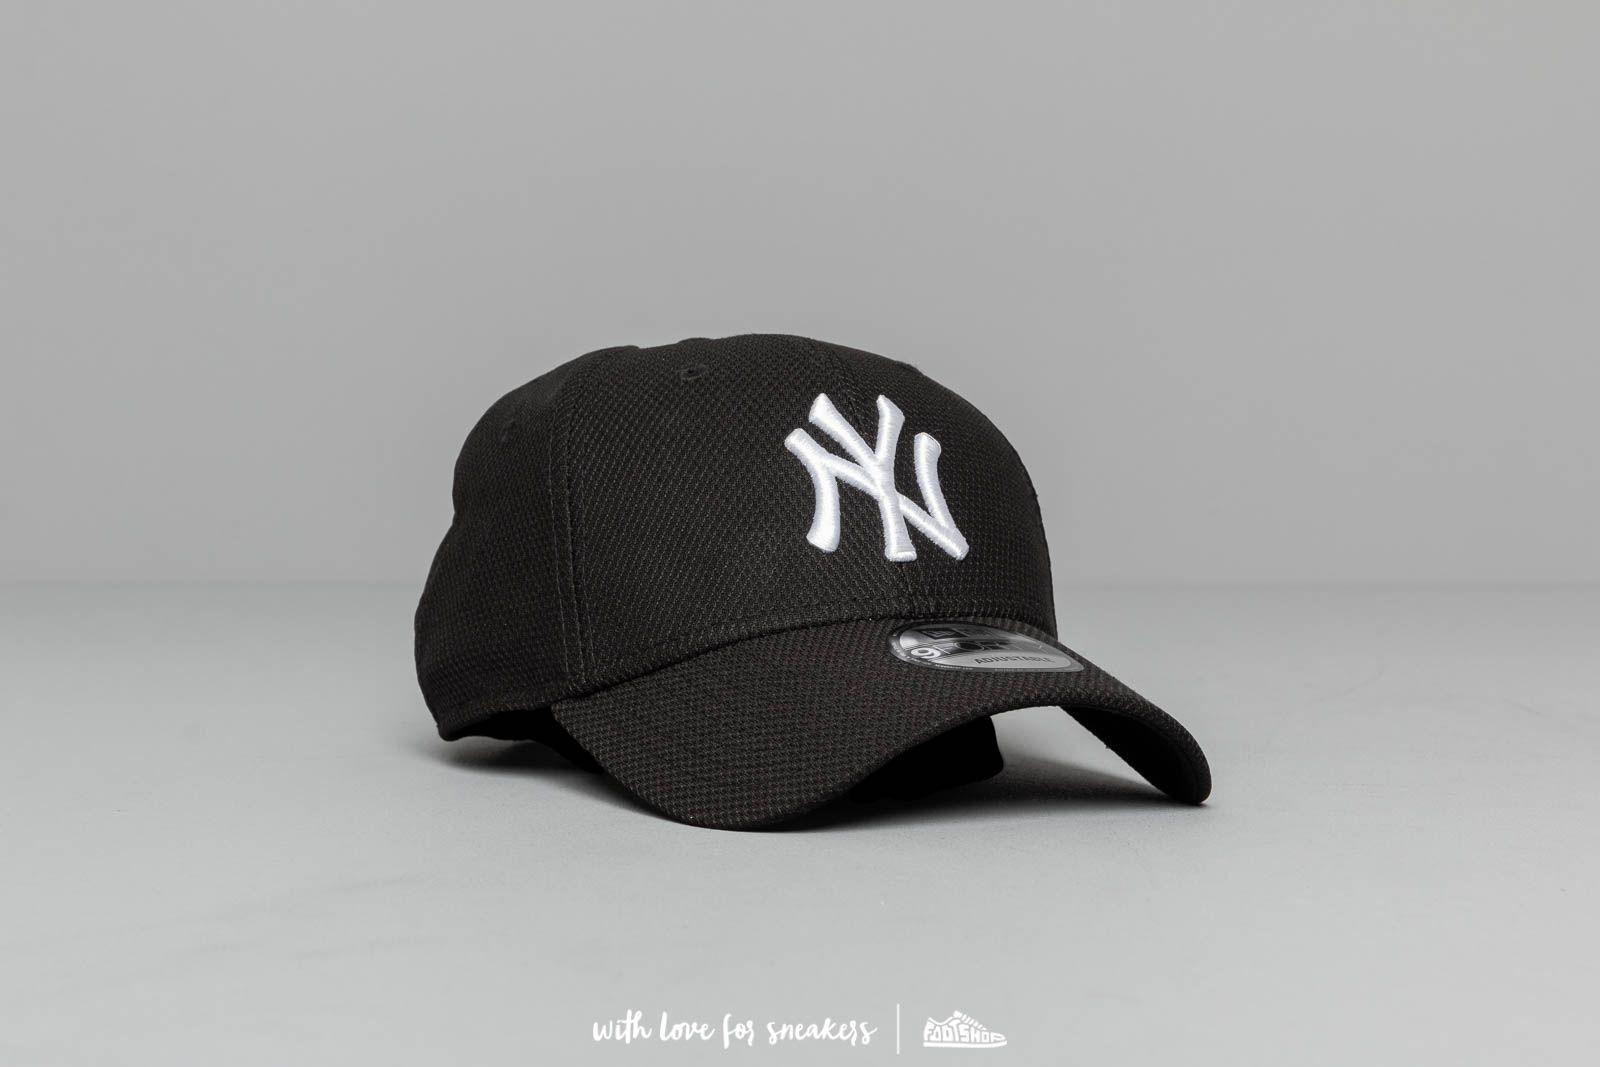 6138cfeeeb2e0 New Era 9Forty MLB Diamond Era New York Yankees Cap at a great price  31 buy